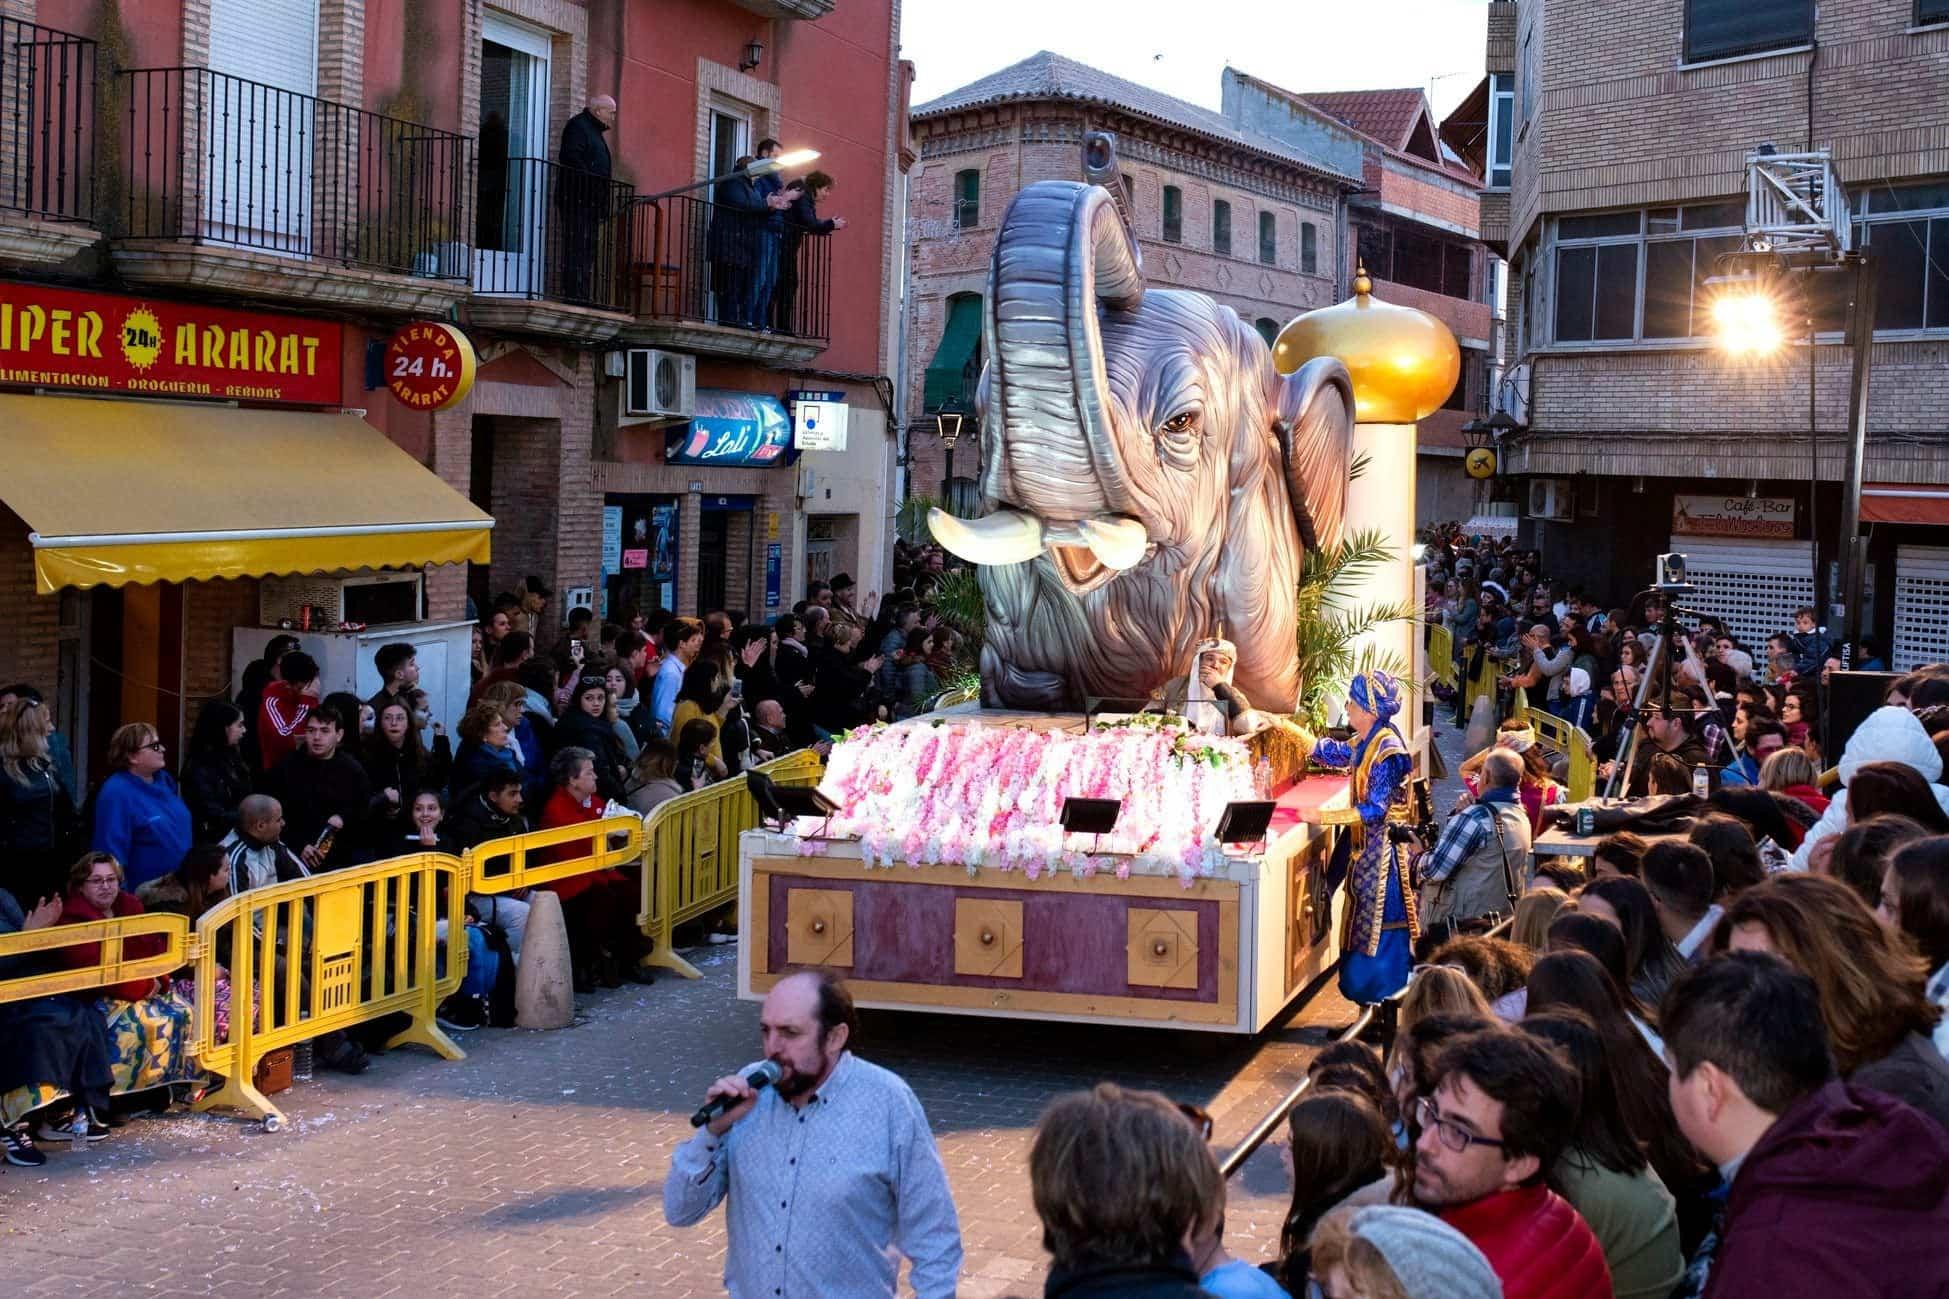 Carnaval de herencia 2020 ofertorio 76 - Selección de fotografías del Ofertorio del Carnaval de Herencia